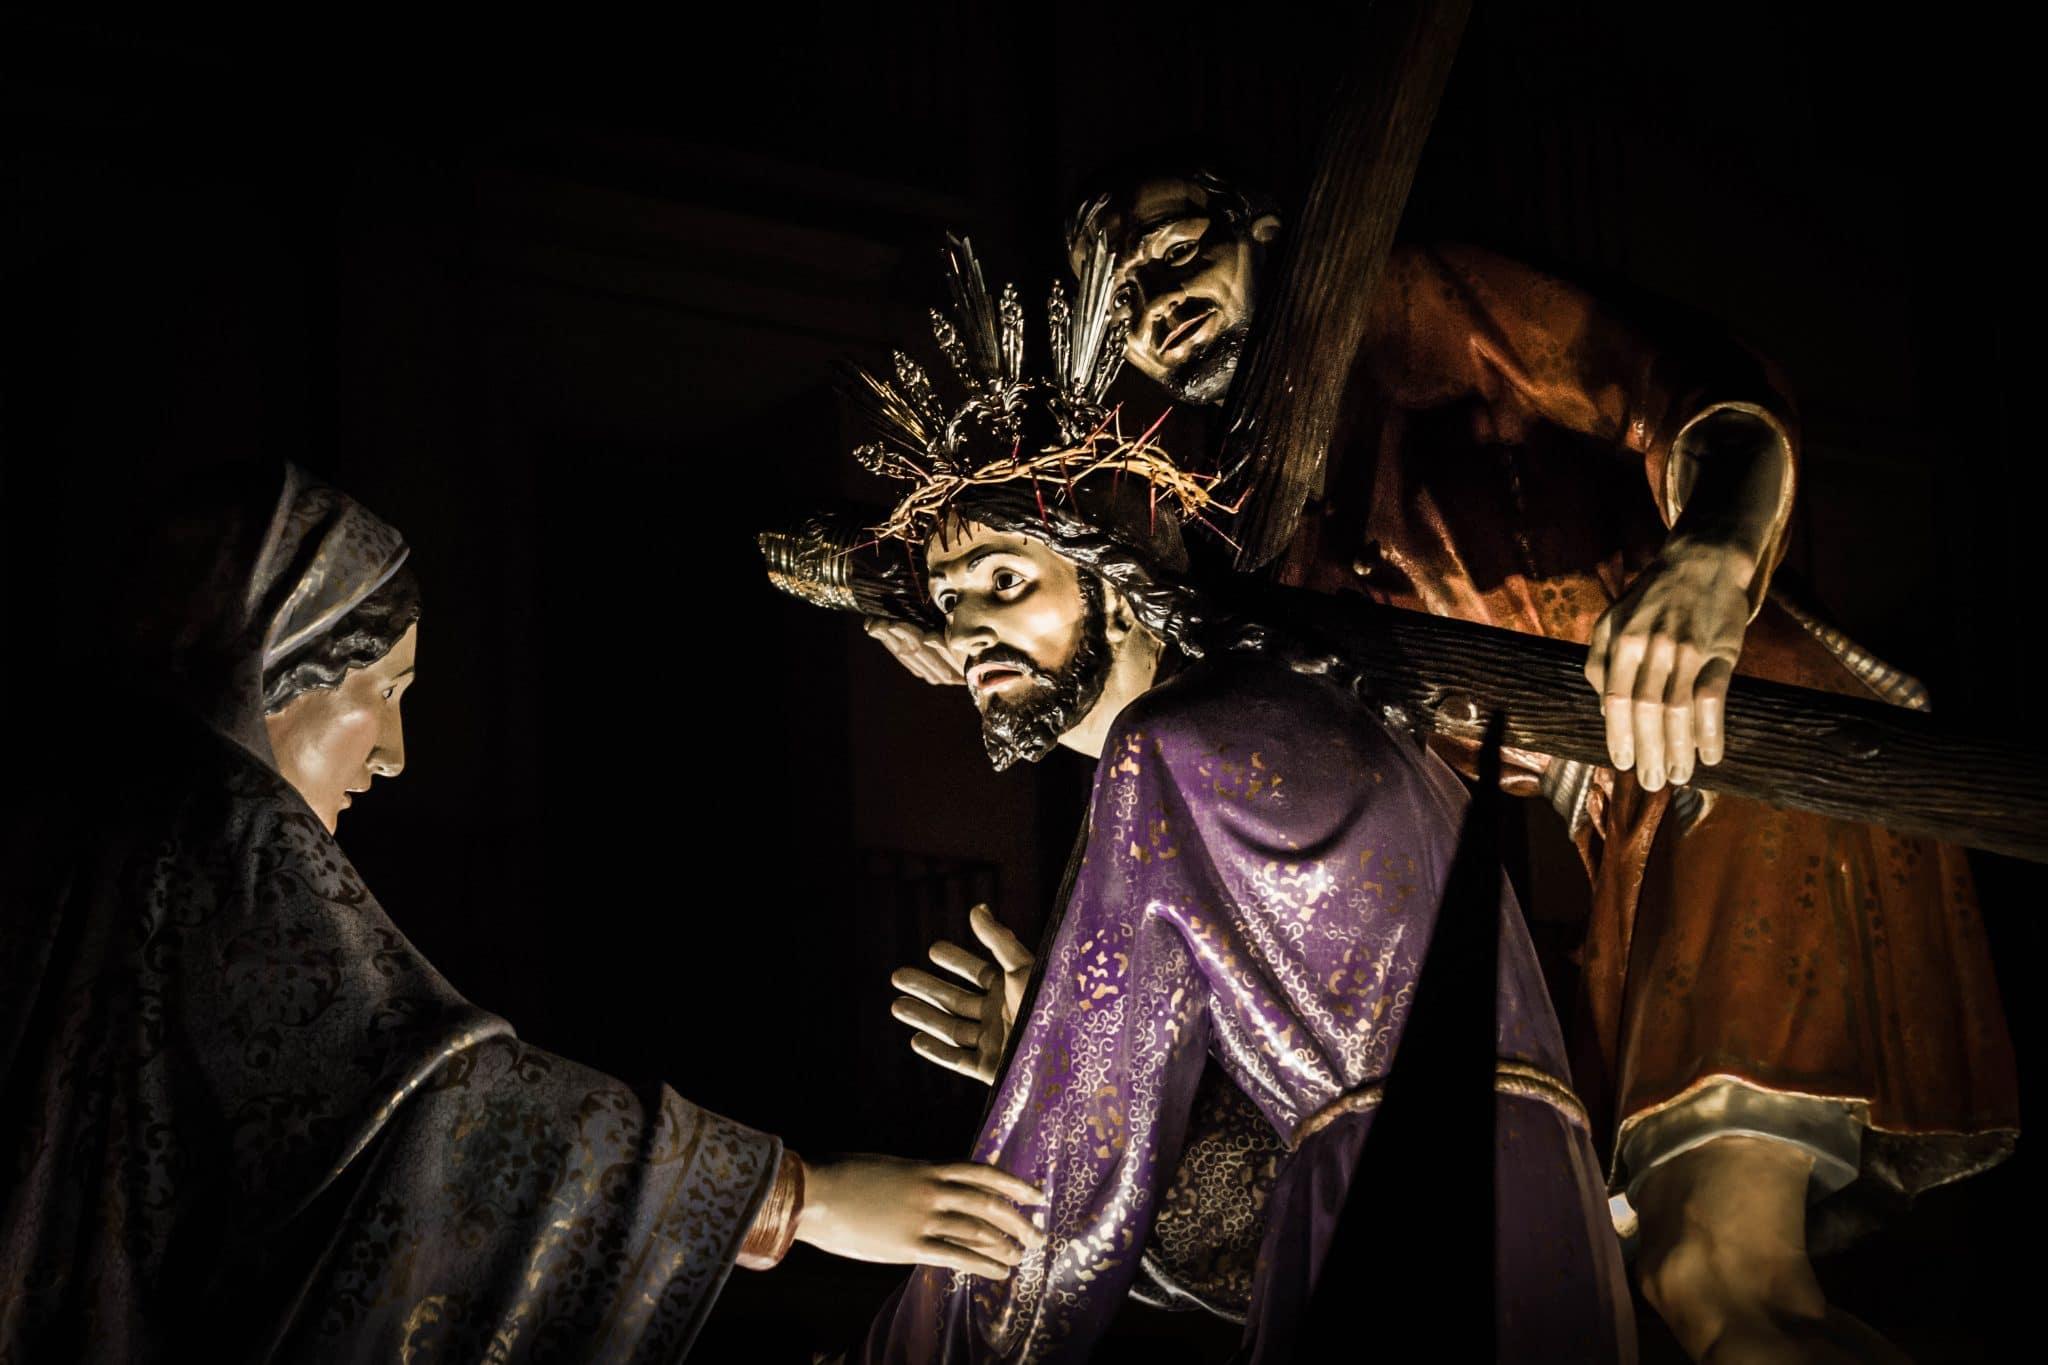 Semana Santa en Zaragoza - Procesion Tres Caídas Calvario